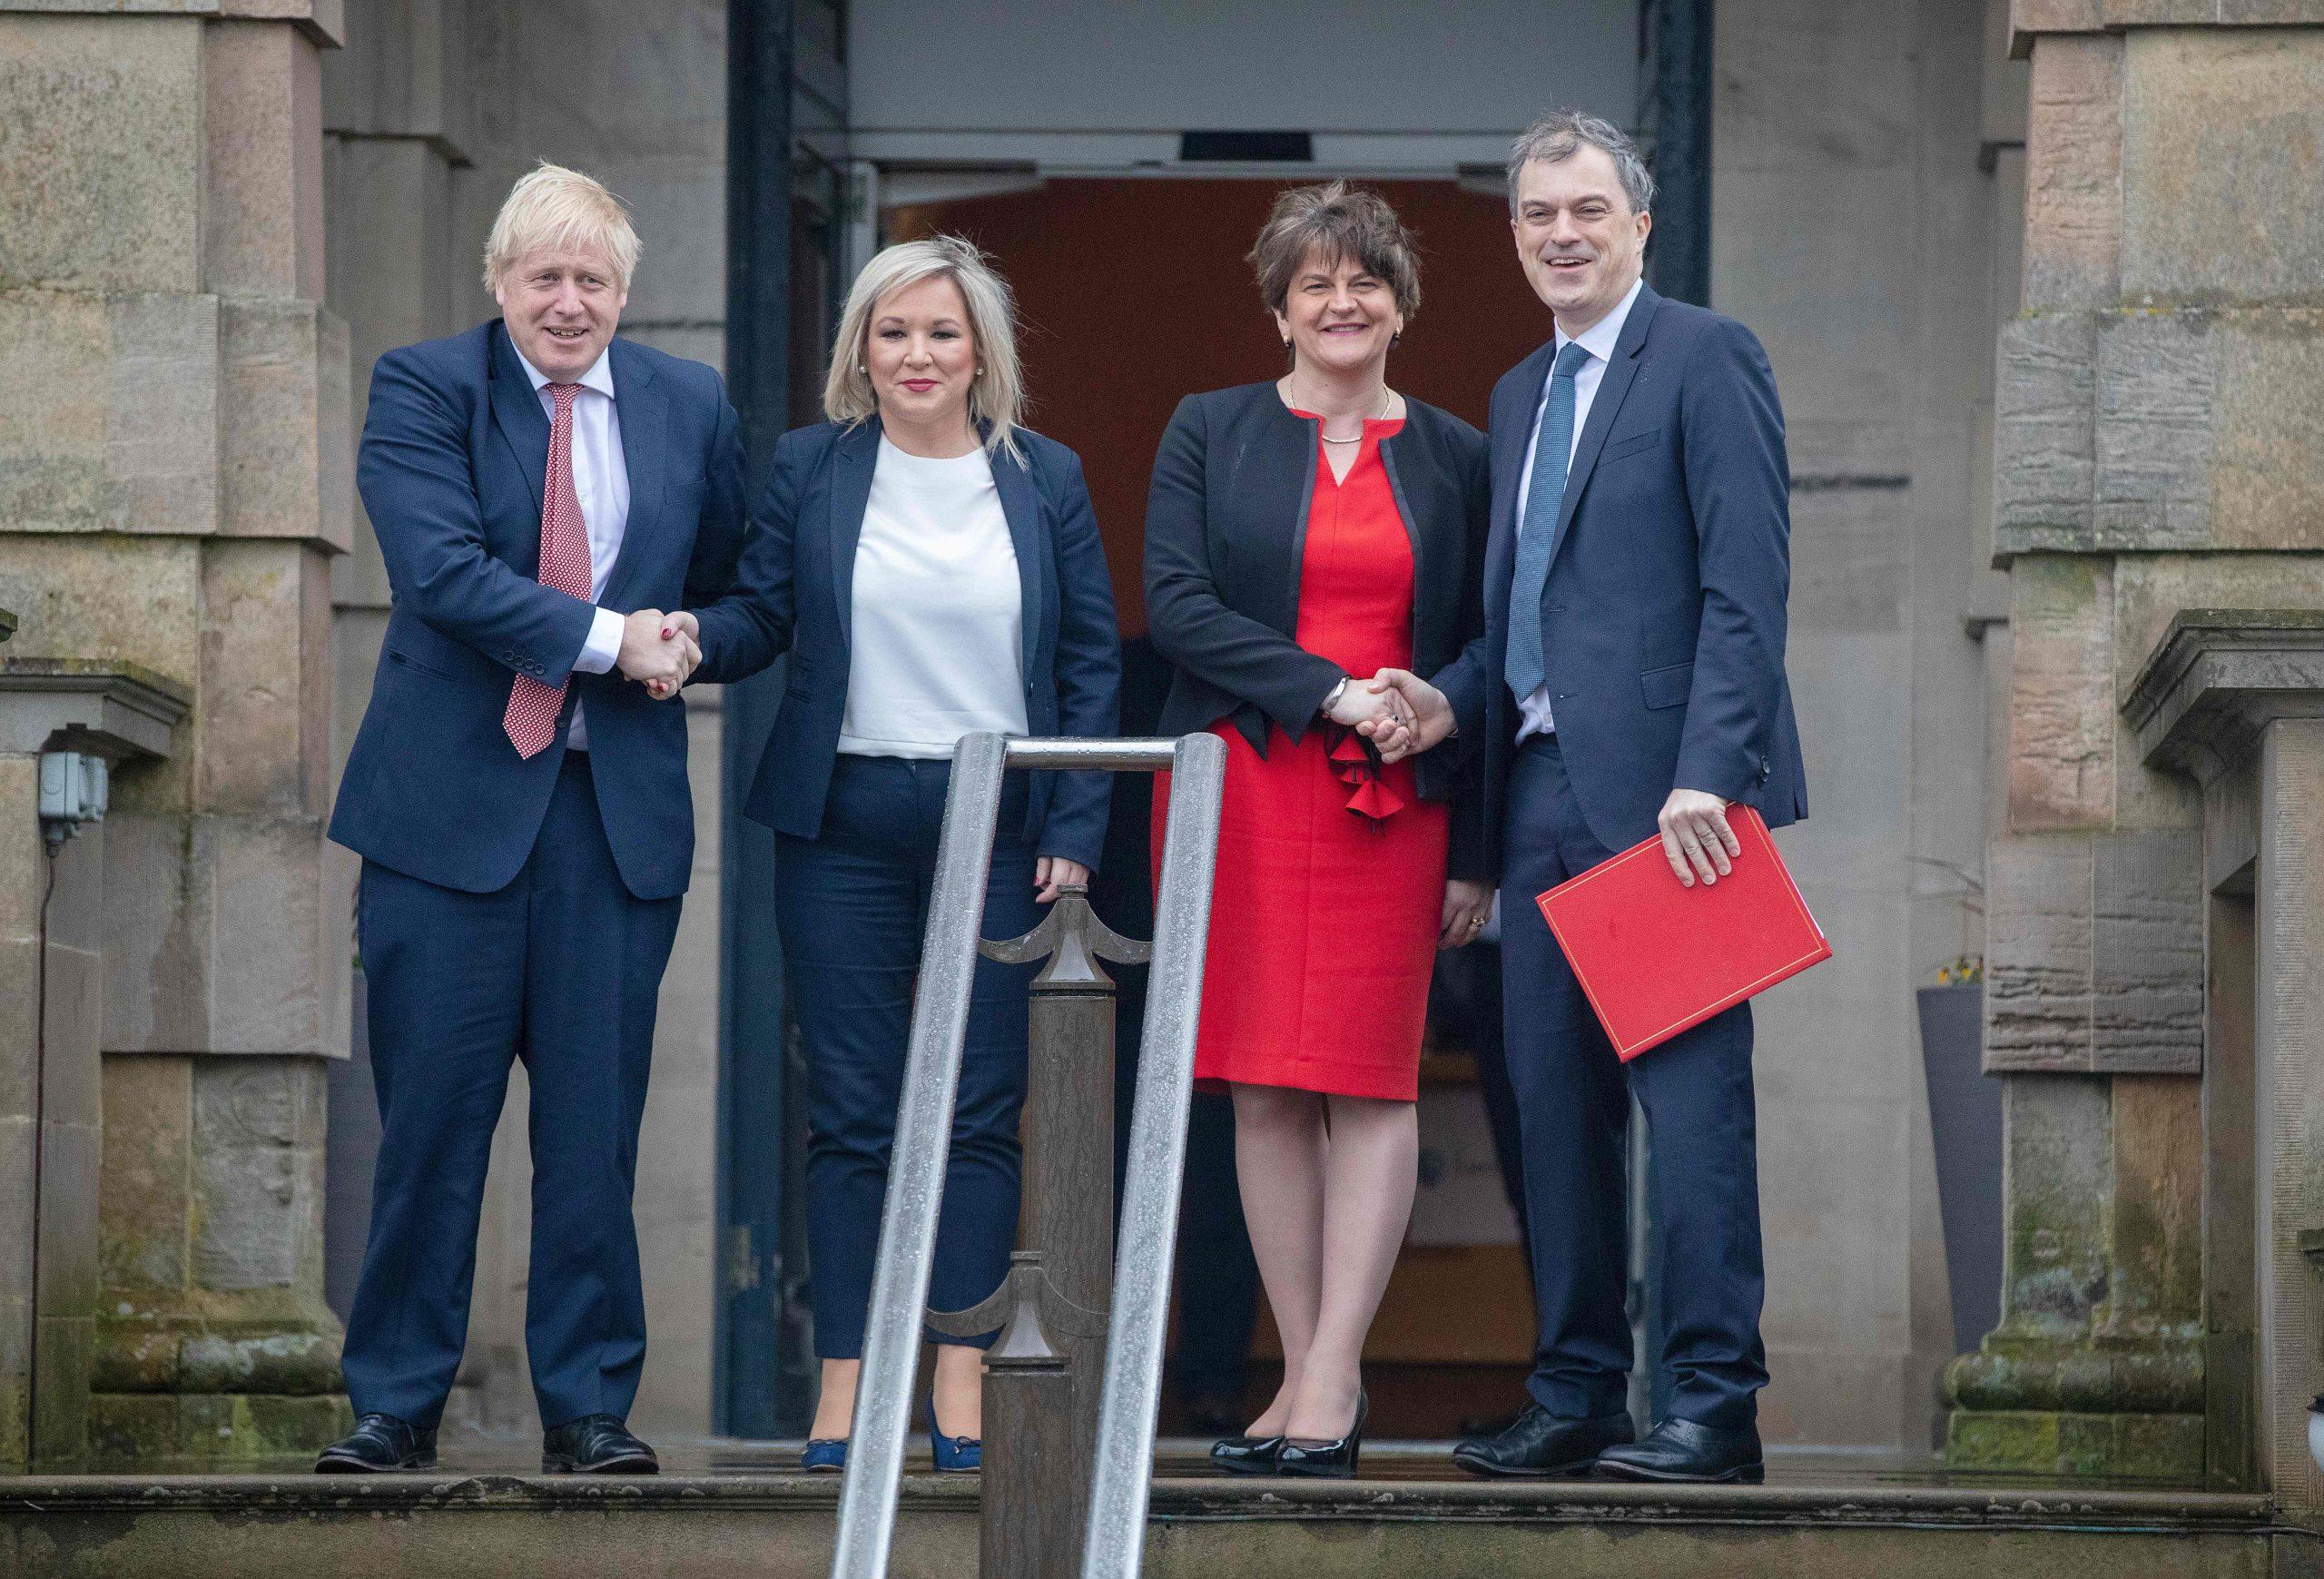 BRITAIN-NIRELAND-IRELAND-POLITICS-DIPLOMACY